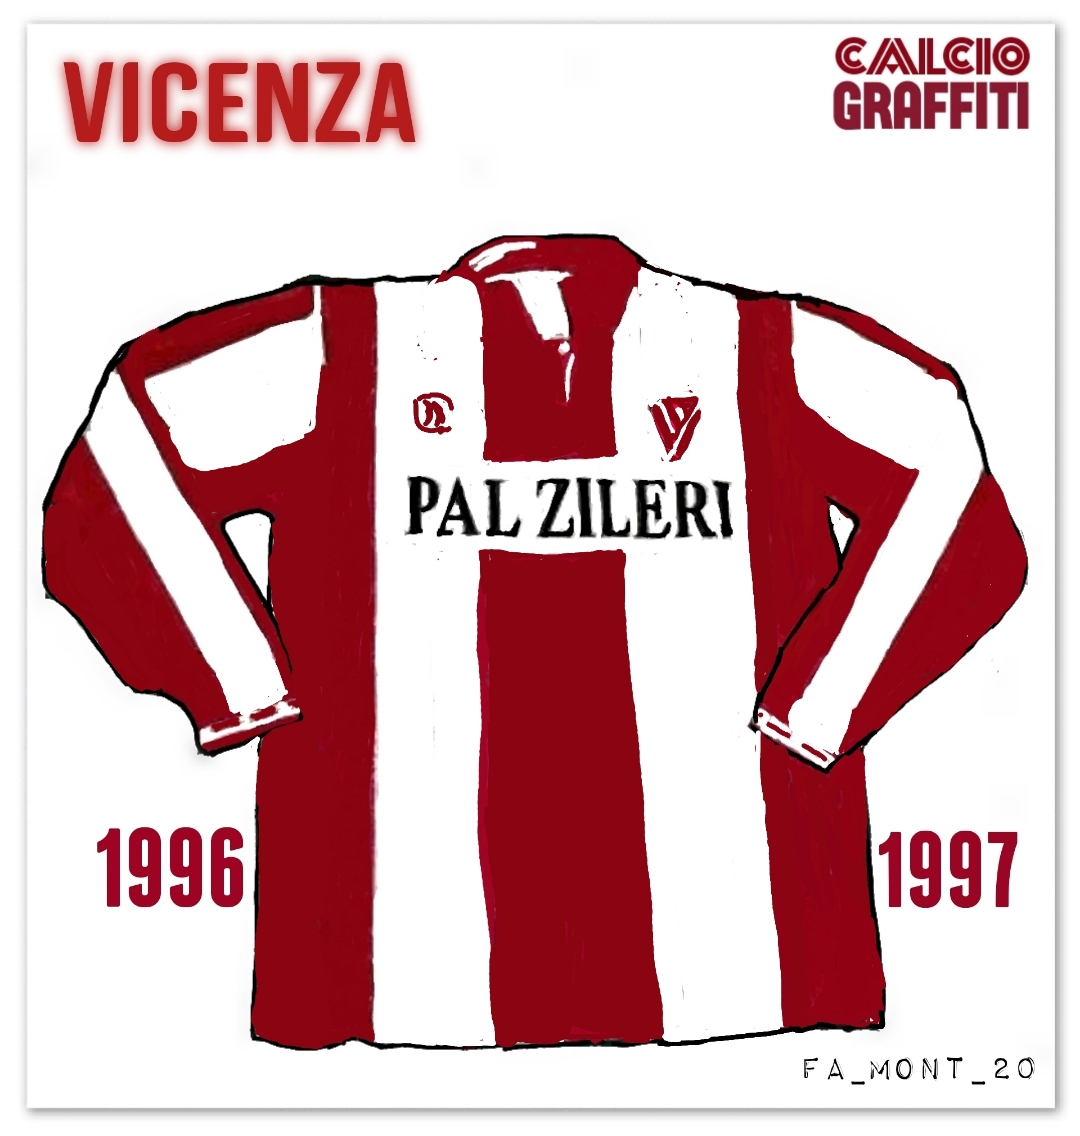 VICENZA 1996-1997